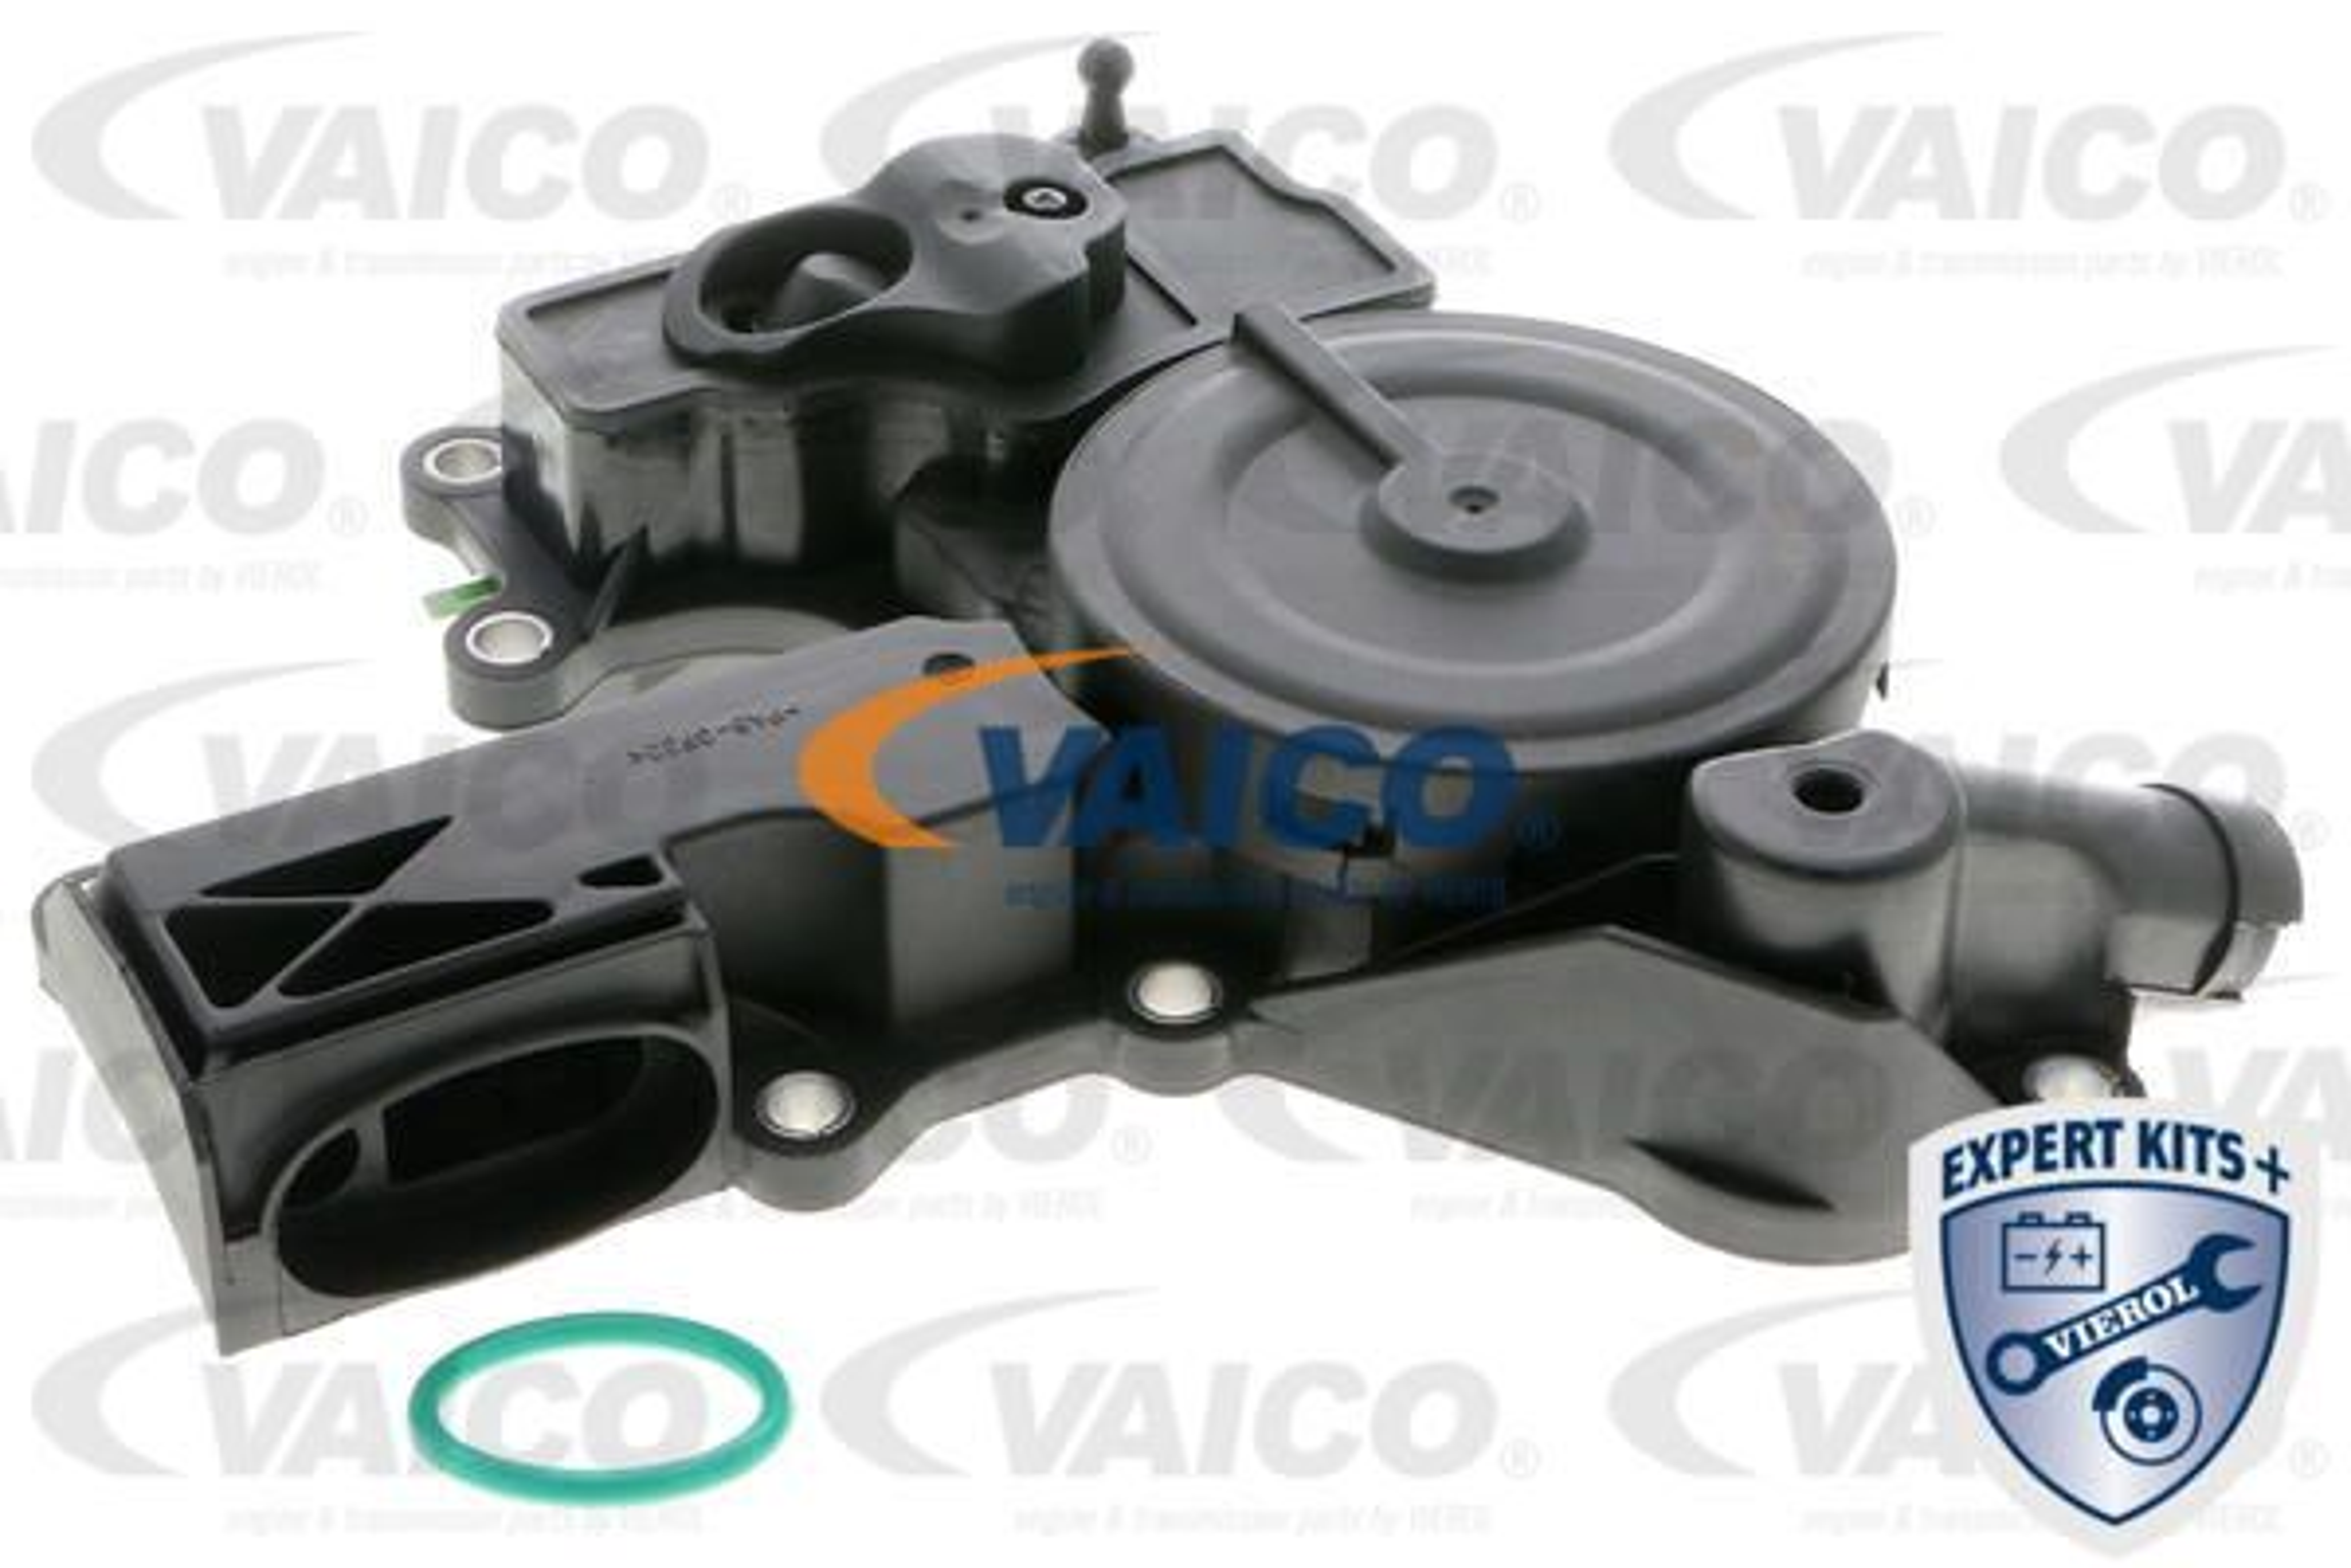 Separador de aceite, aireación cárter aceite V10-2595 VAICO V10-2595 en calidad original